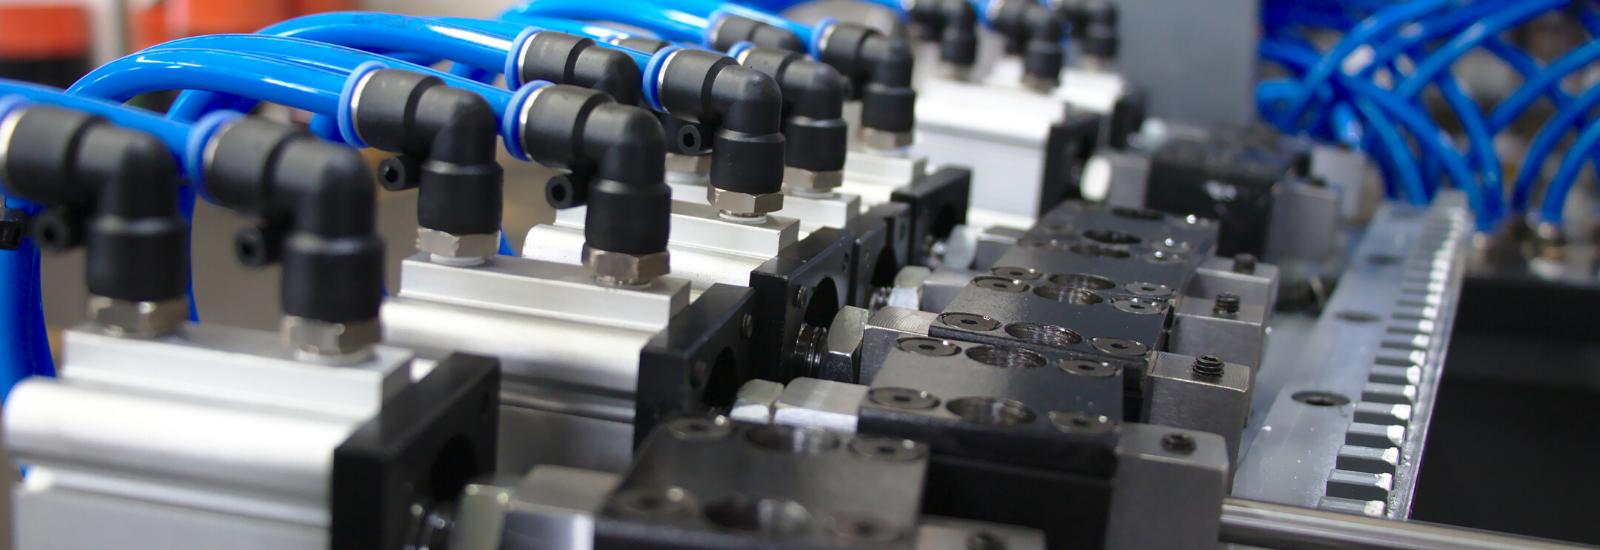 lubrificanti sintetici per cilindri pneumatici